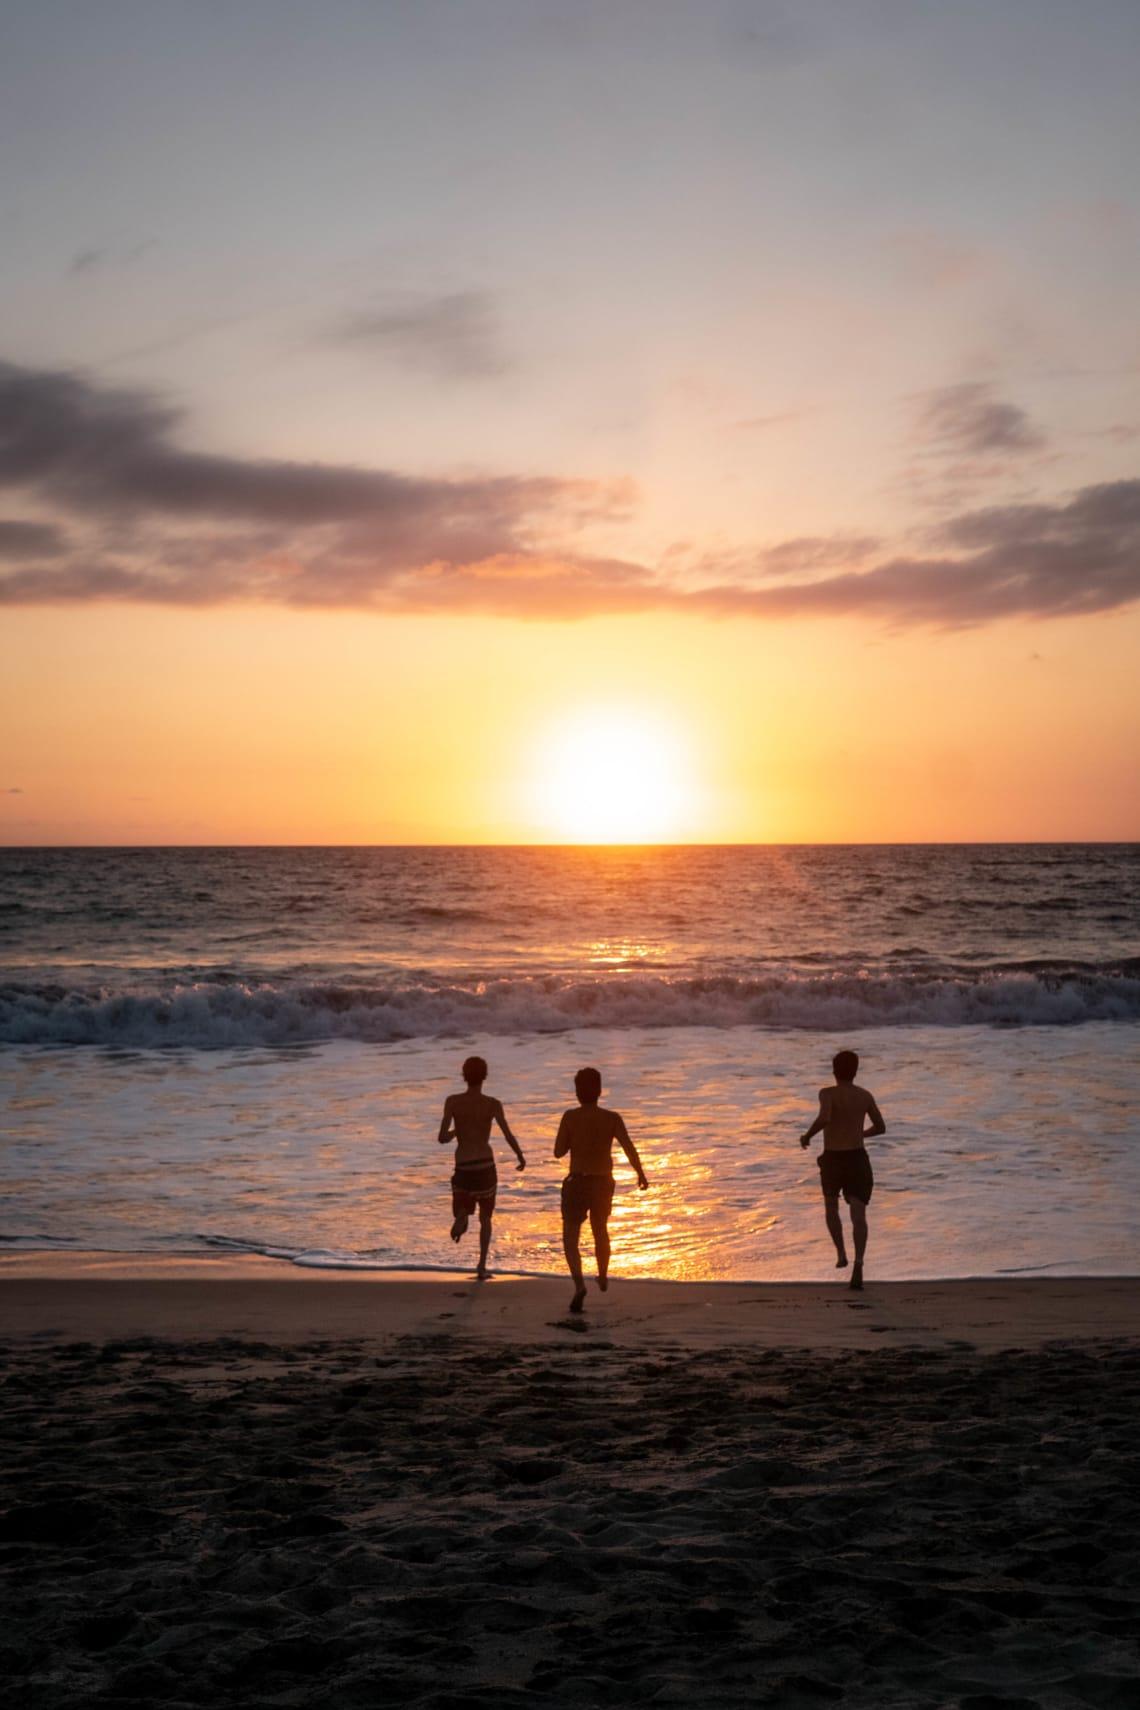 Lugares baratos para visitar Puerto Escondido, México - Worldpackers - atardecer en playa puerto escondido mexico